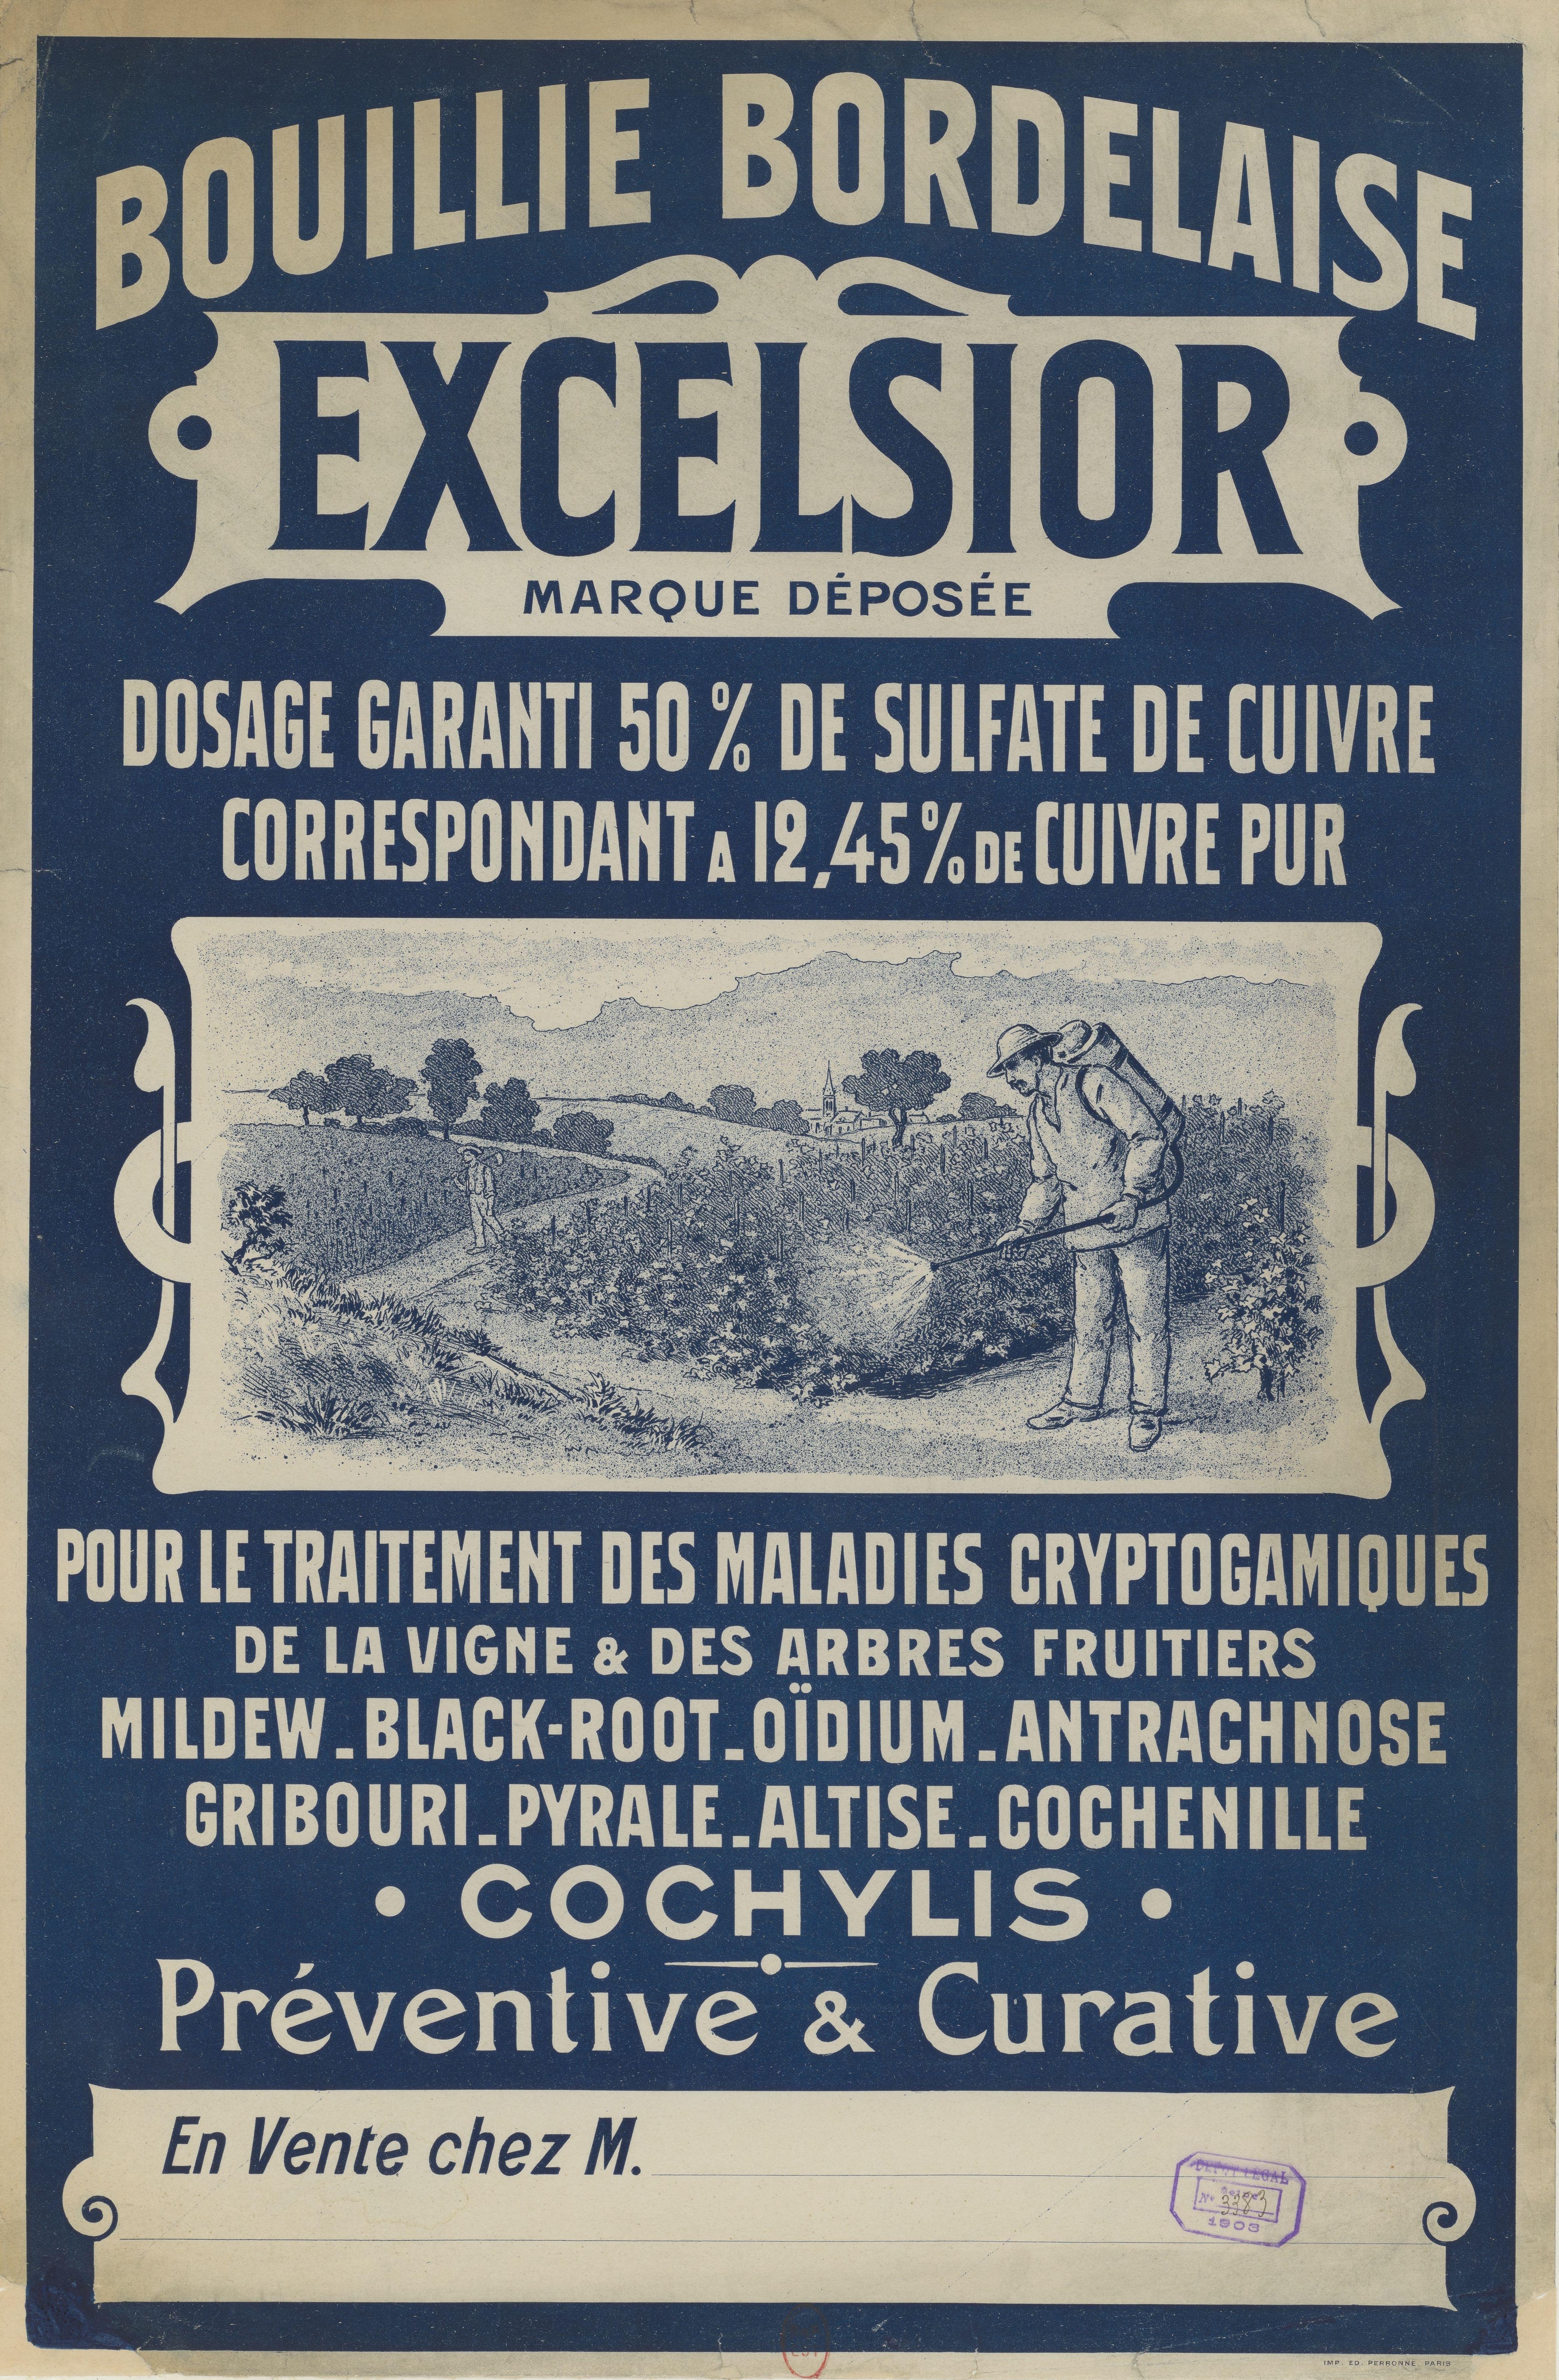 Bouillie bourdelaise 1903